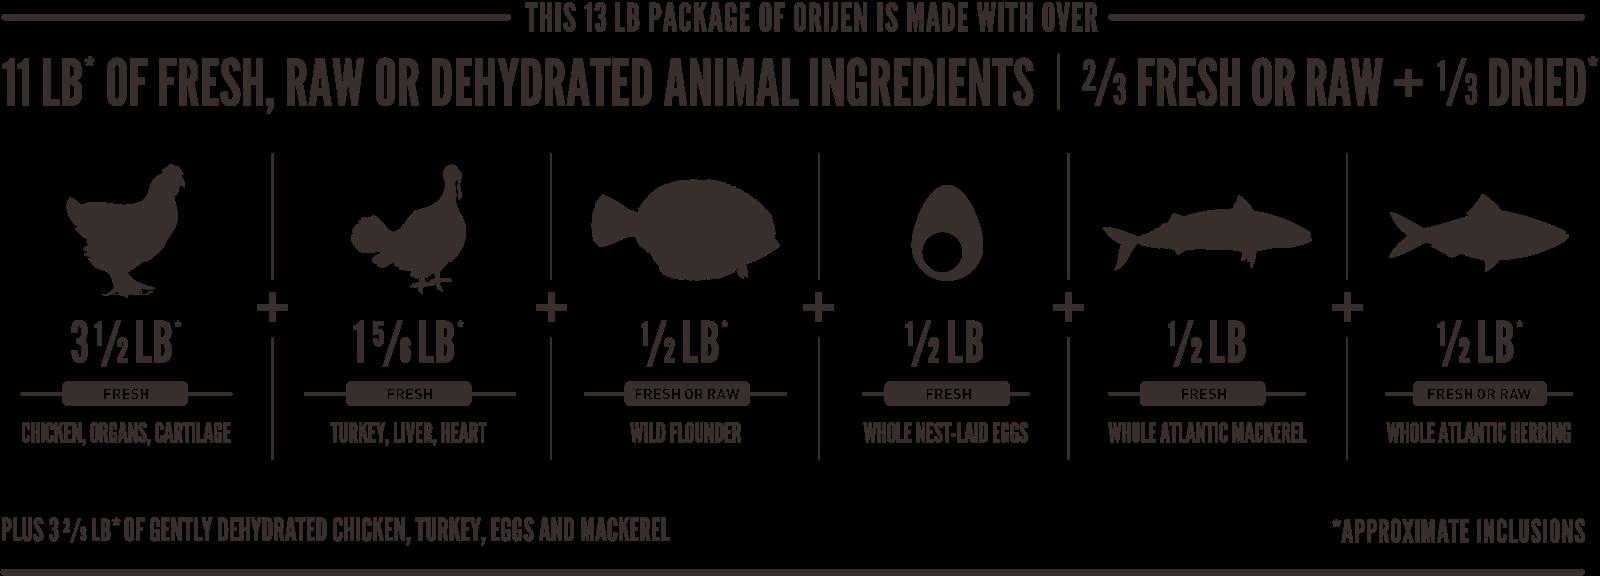 ORIJEN Puppy Meatmath Formula and Dog Food Ingredients